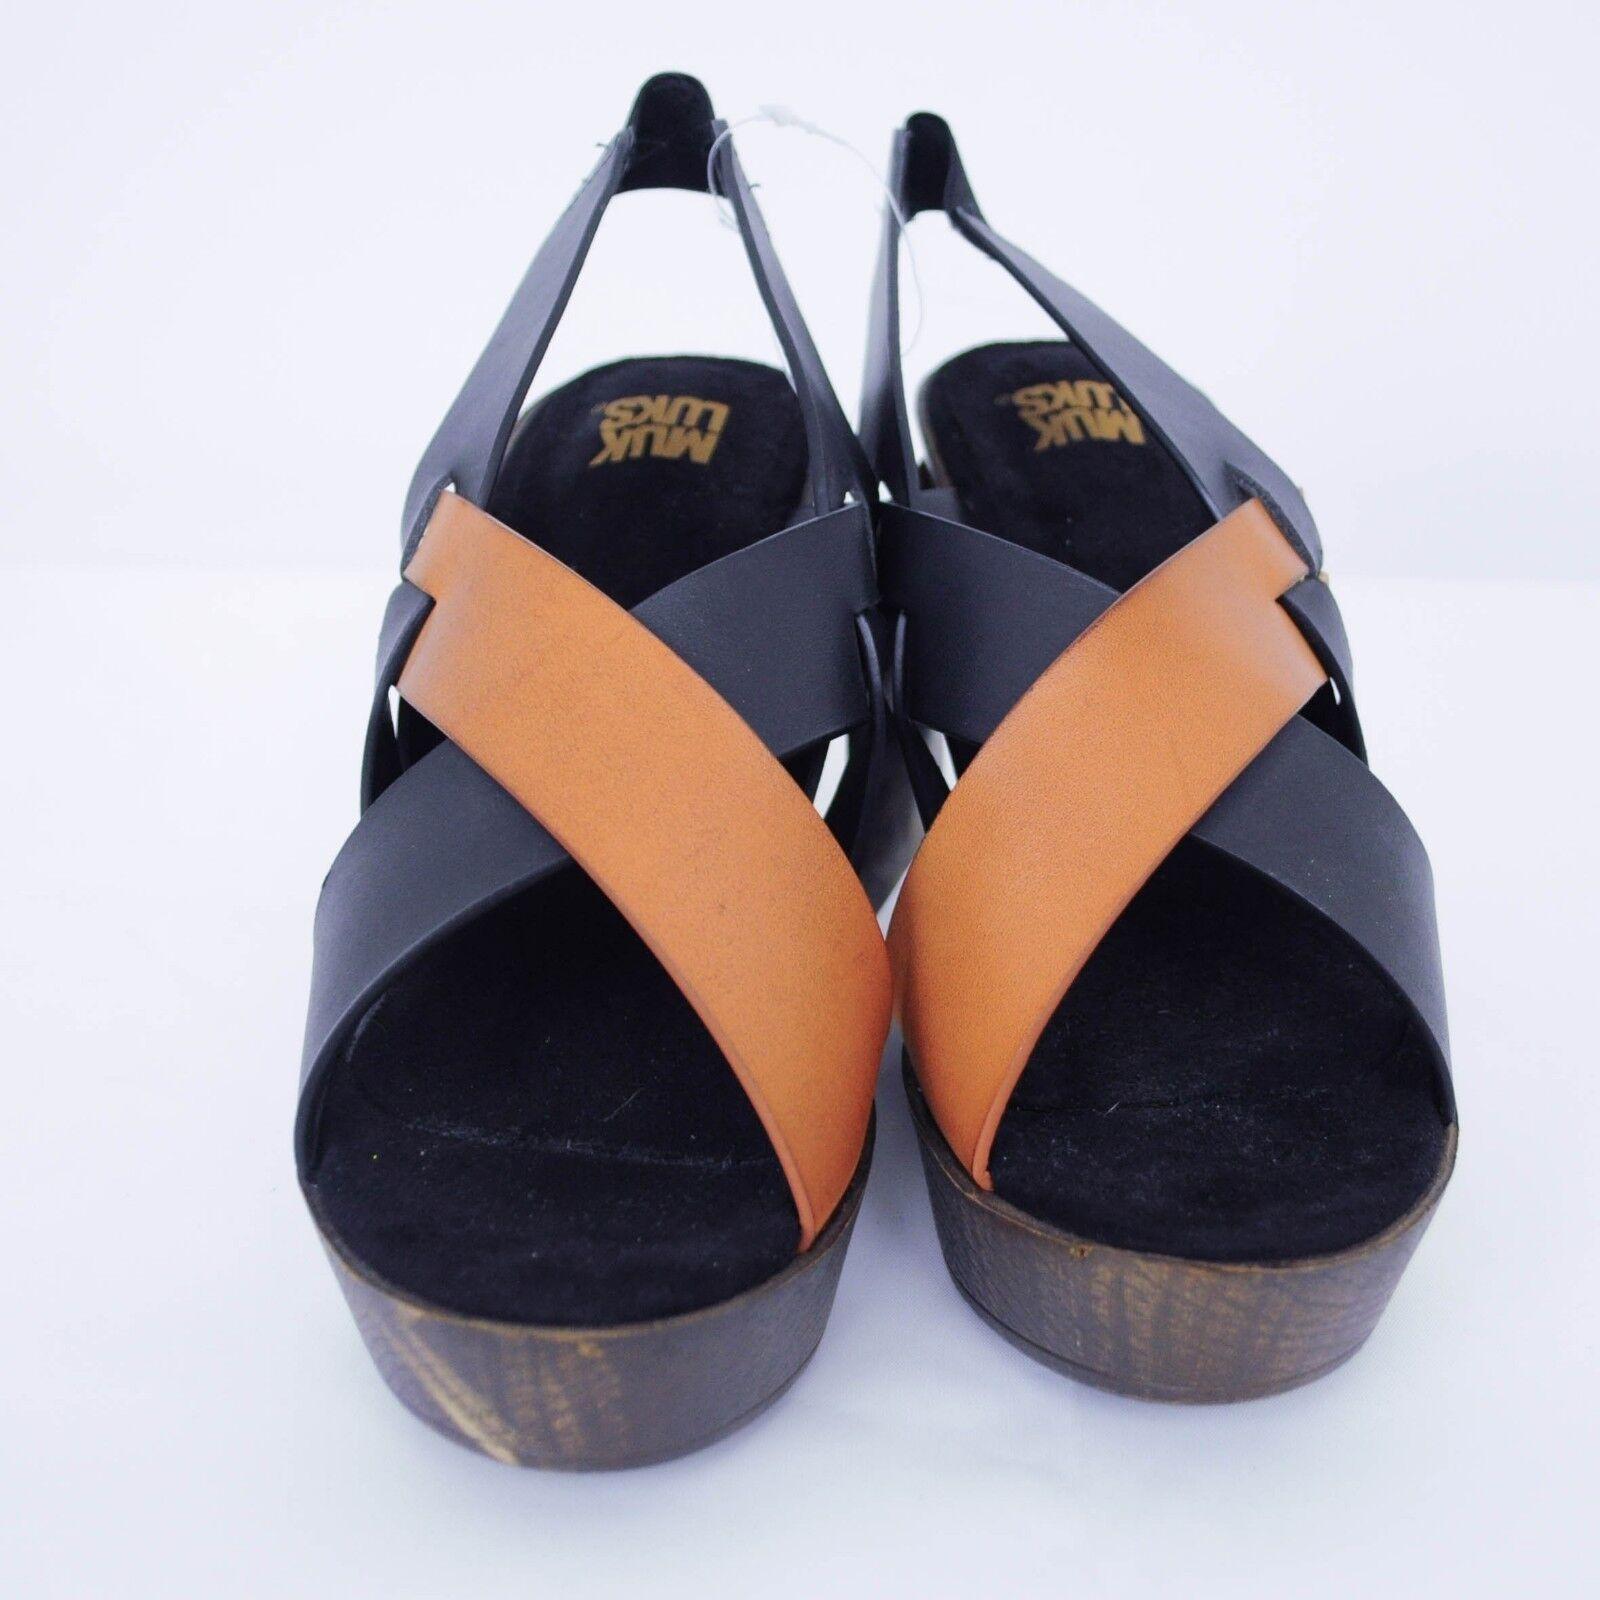 NEW 95 MUK Sandale LUKS Beth Platform Wedge Sandale MUK Damenschuhe Sz 9 Cognac Vegan Leder c322de